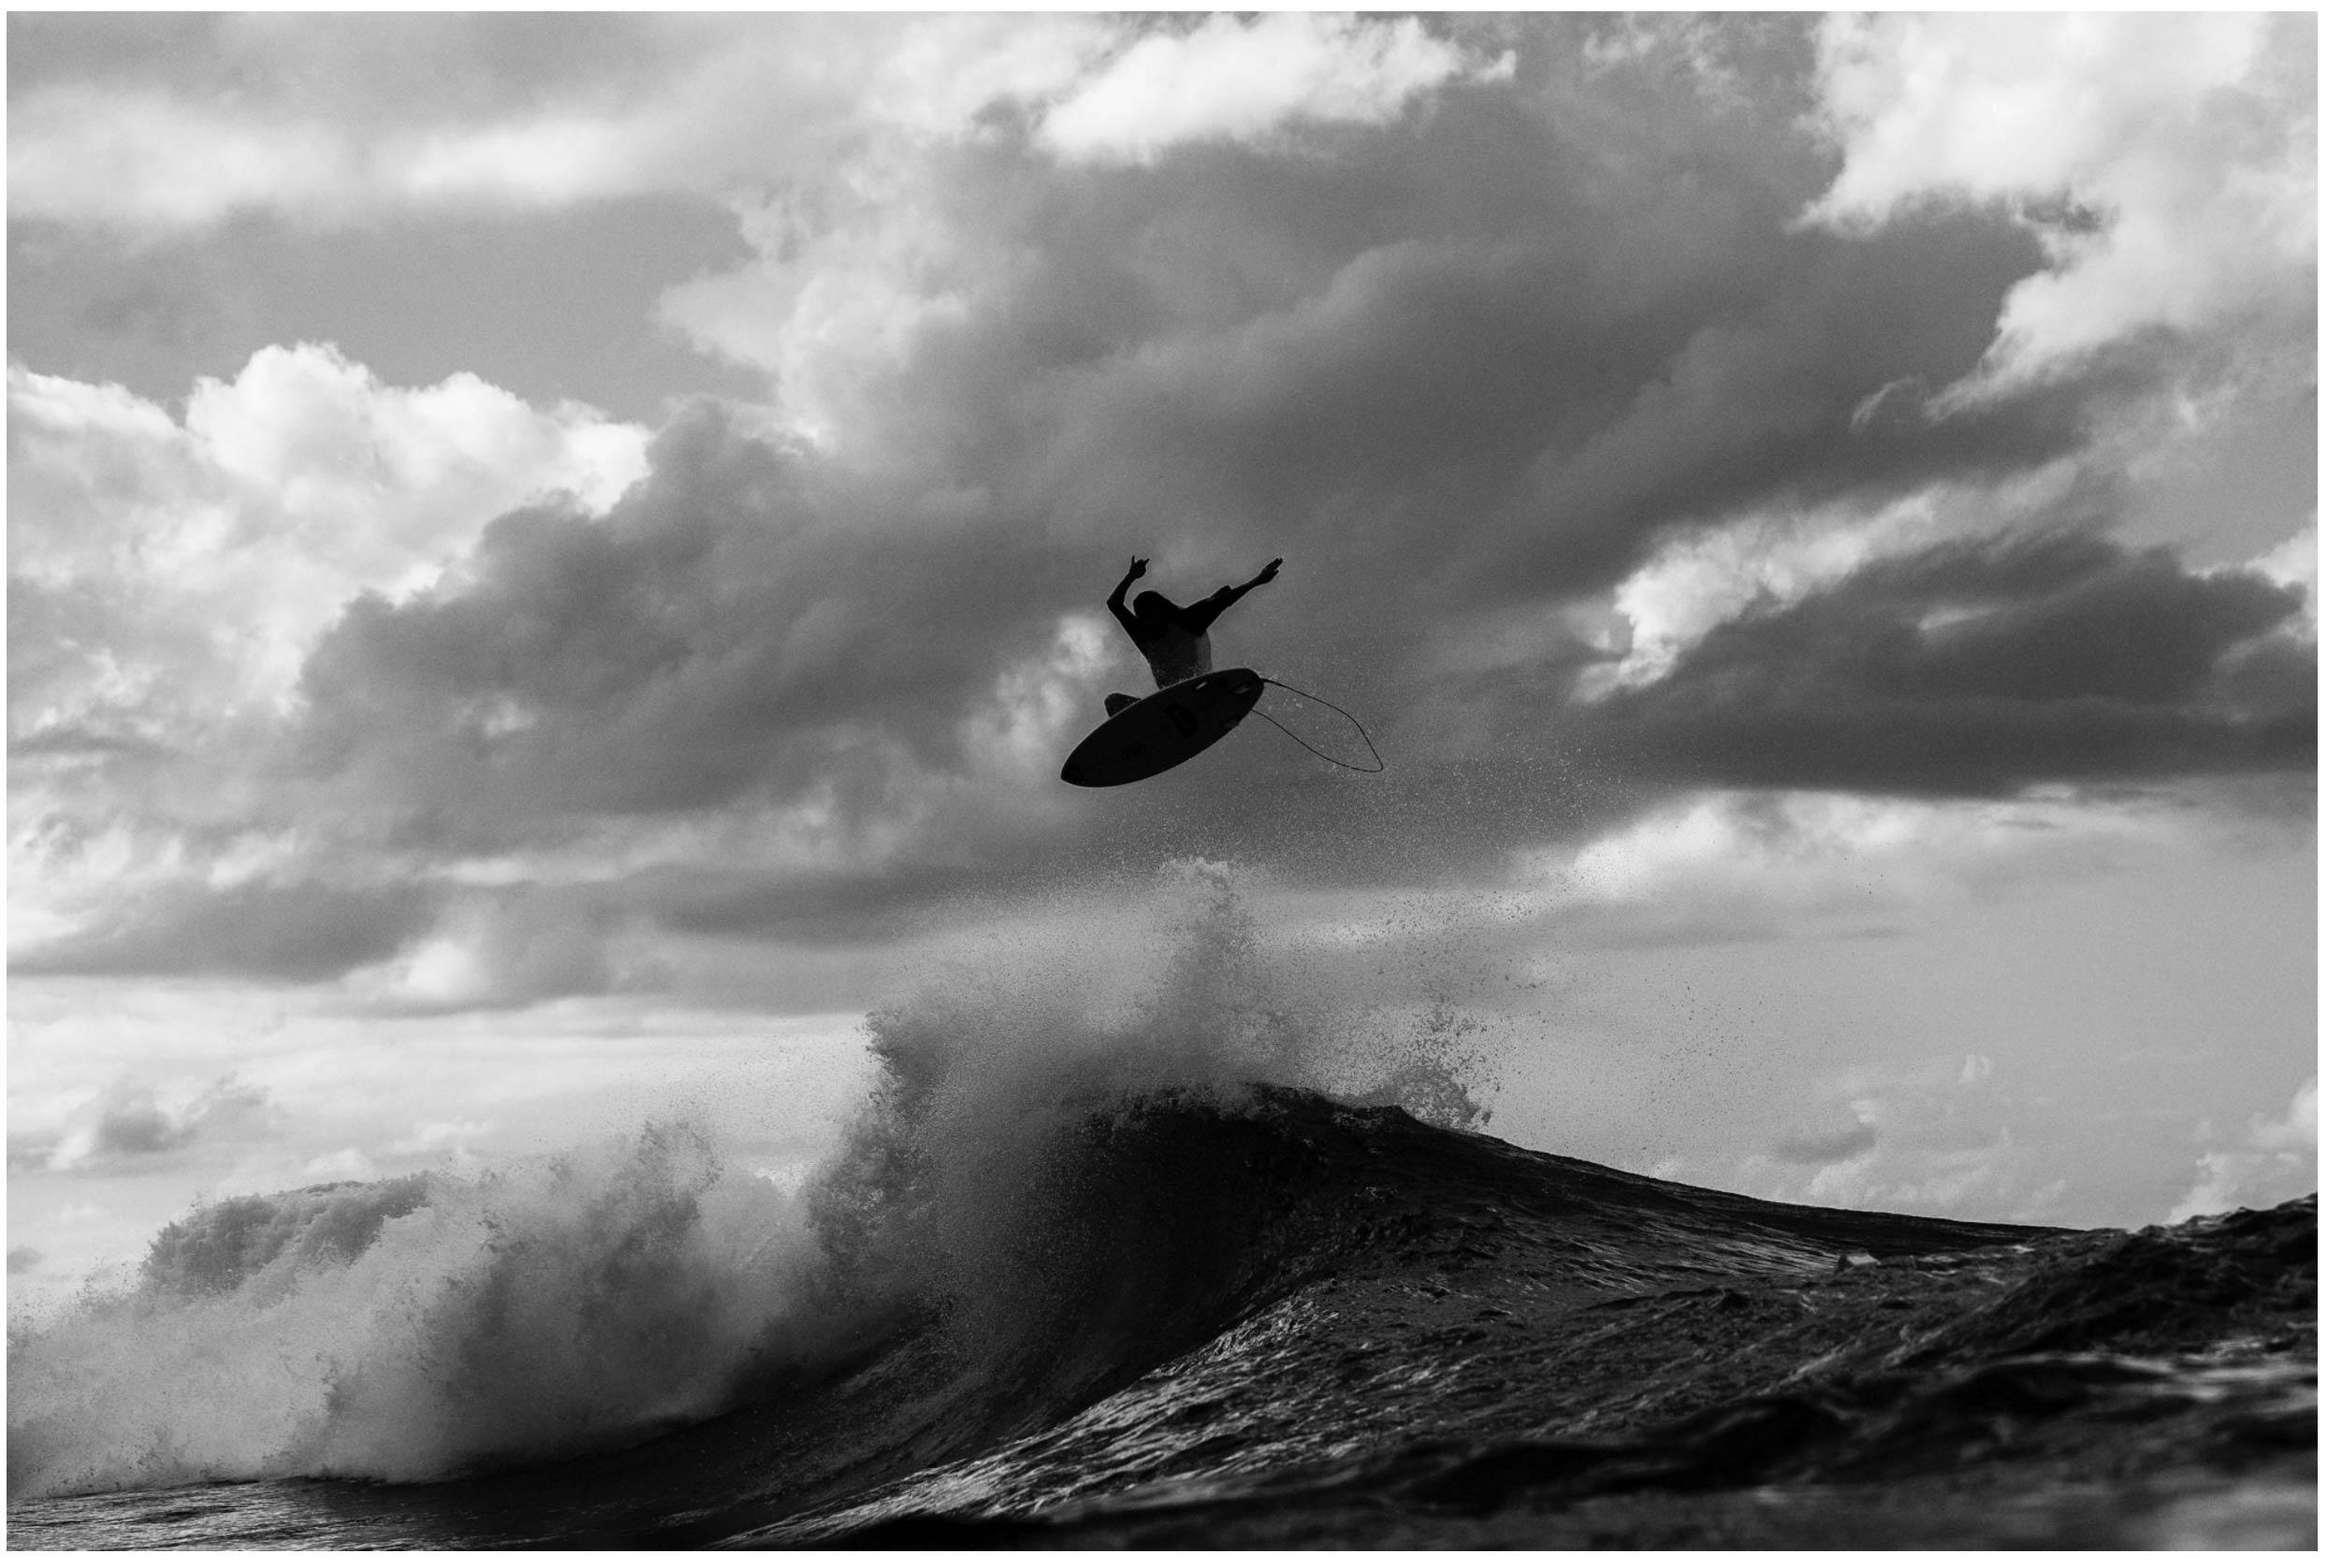 rodd-owen-surf-photography-for-sale-owenphoto-253.jpg